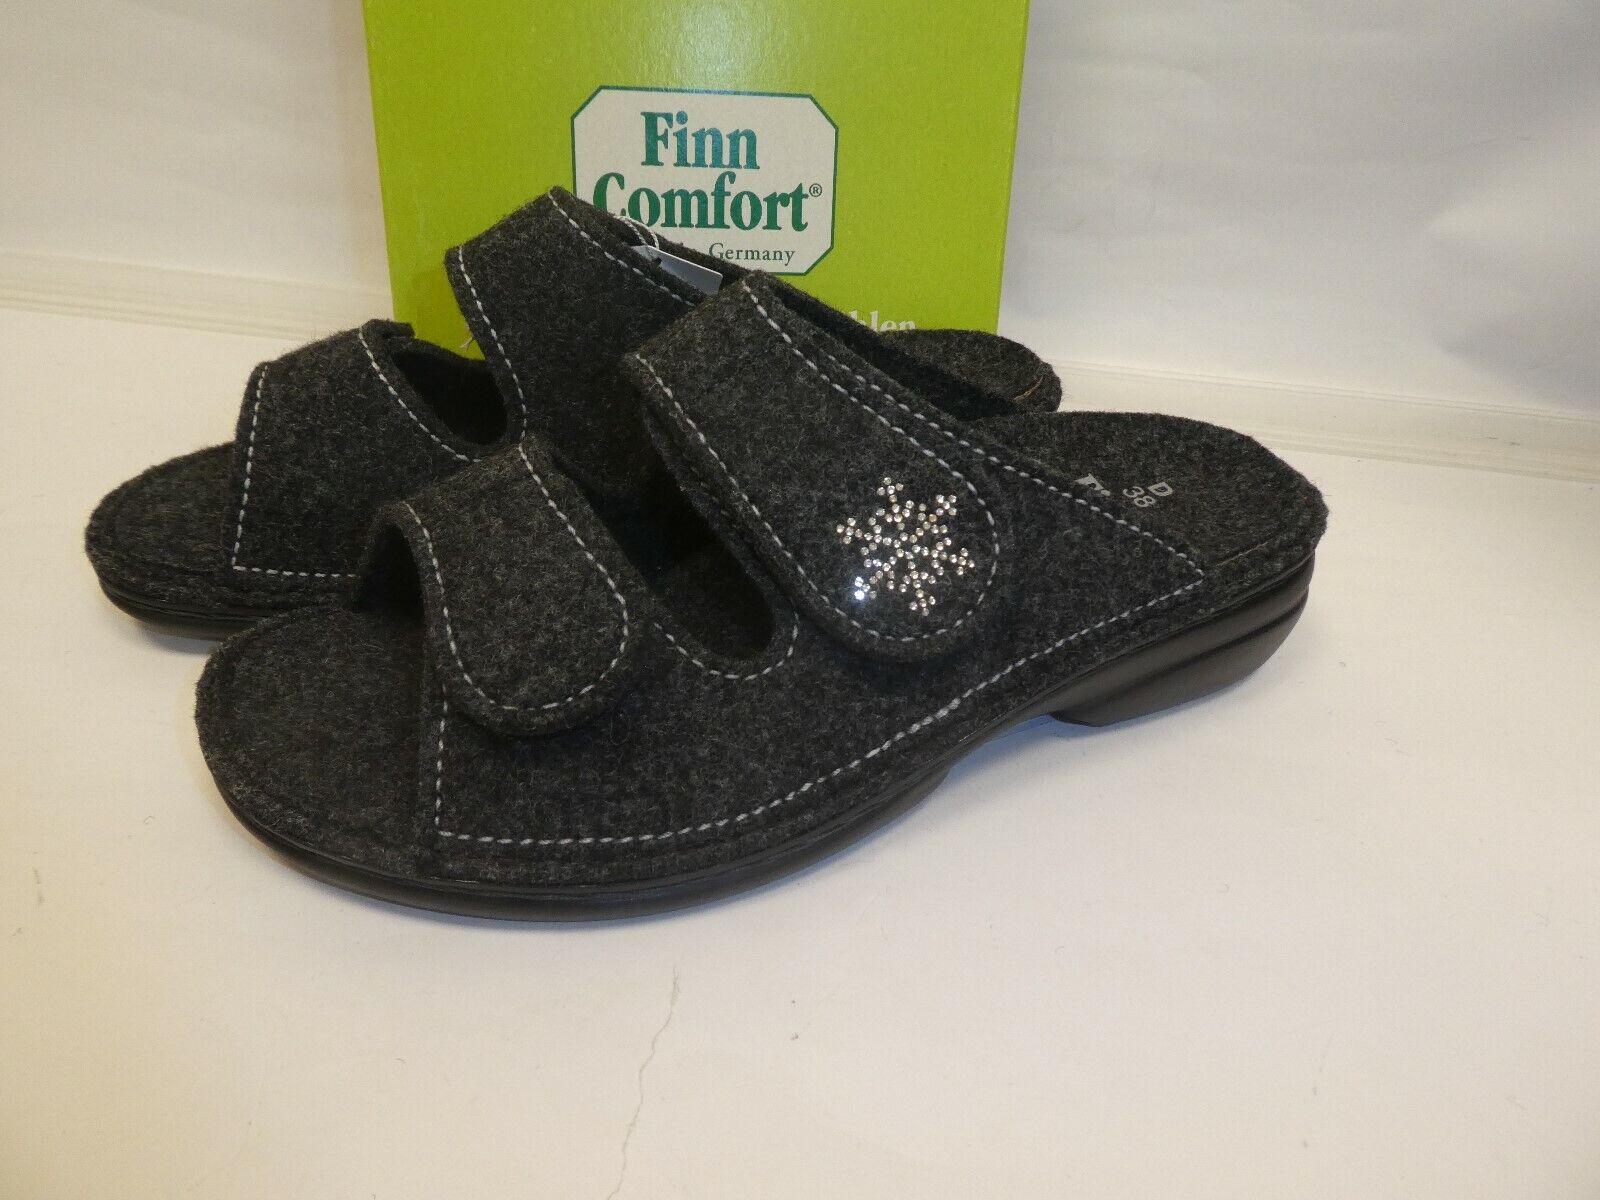 38 Größe Comfort Finn Pantolette b2b04aaxu63565 Halbschuhe